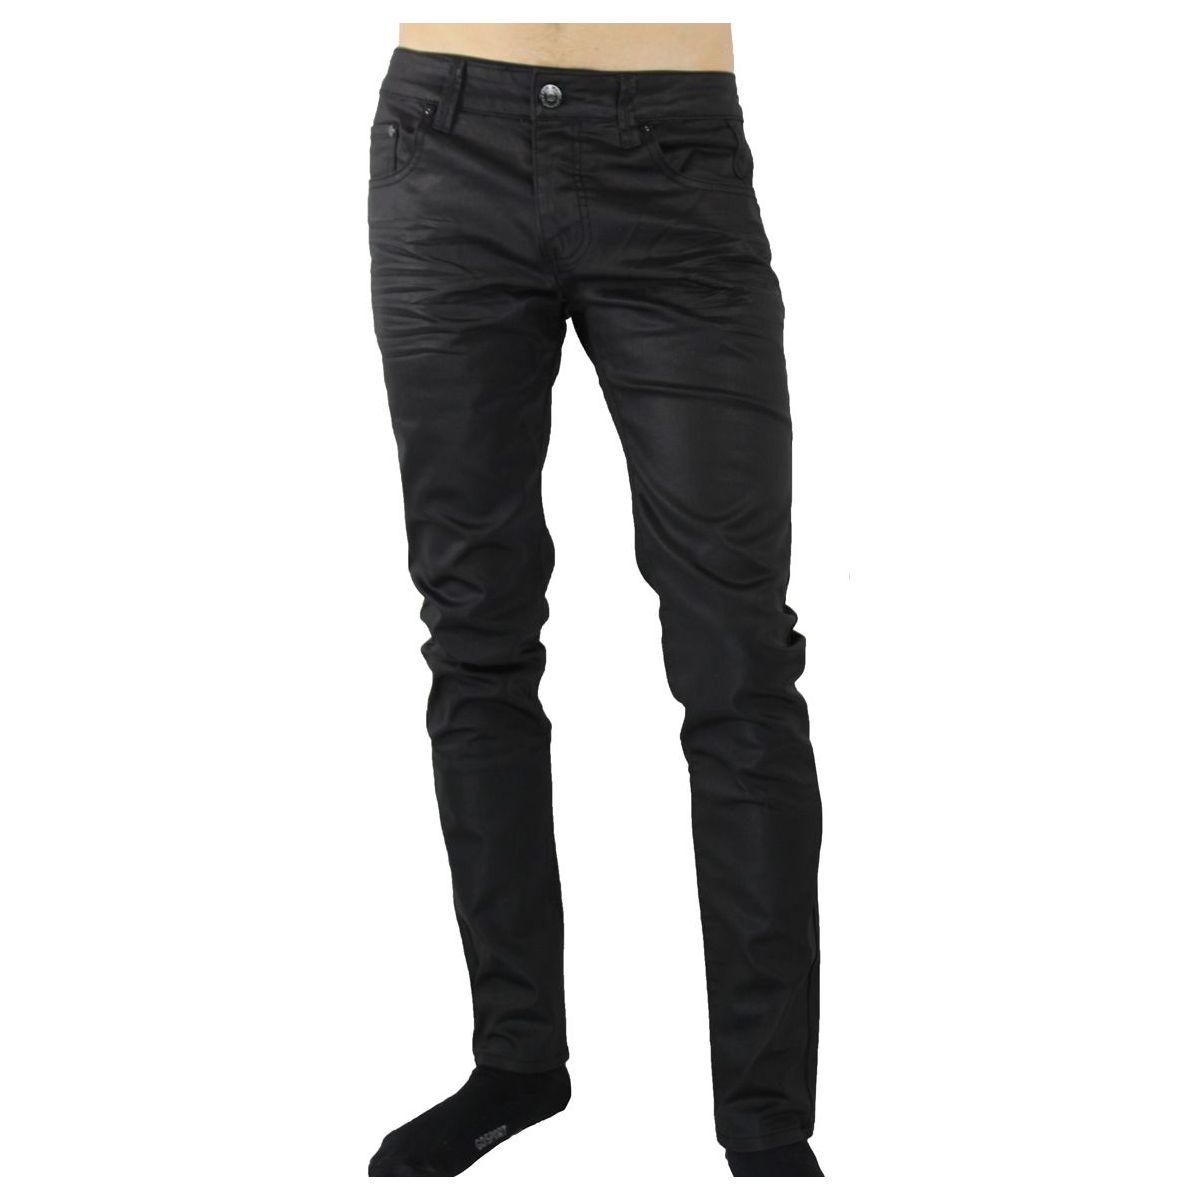 Jeans Dc Shoes Homme